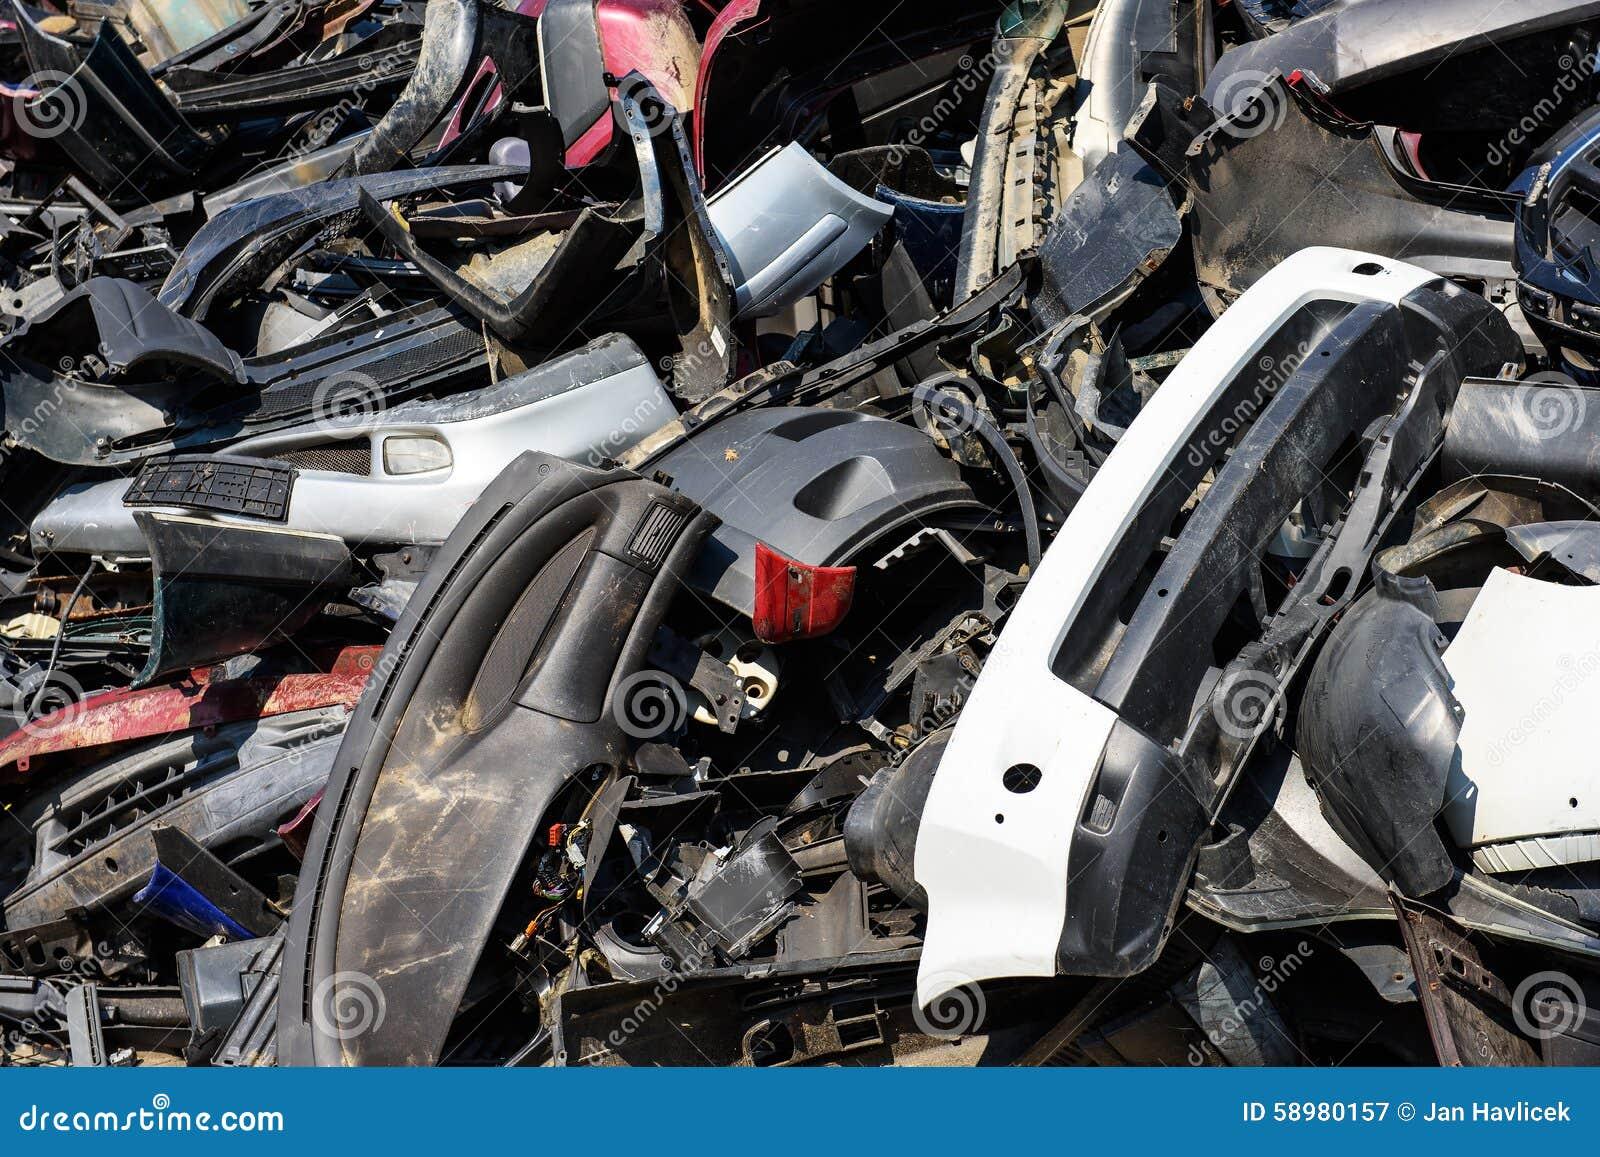 Dump of car wrecks stock image  Image of industrial, rubbish